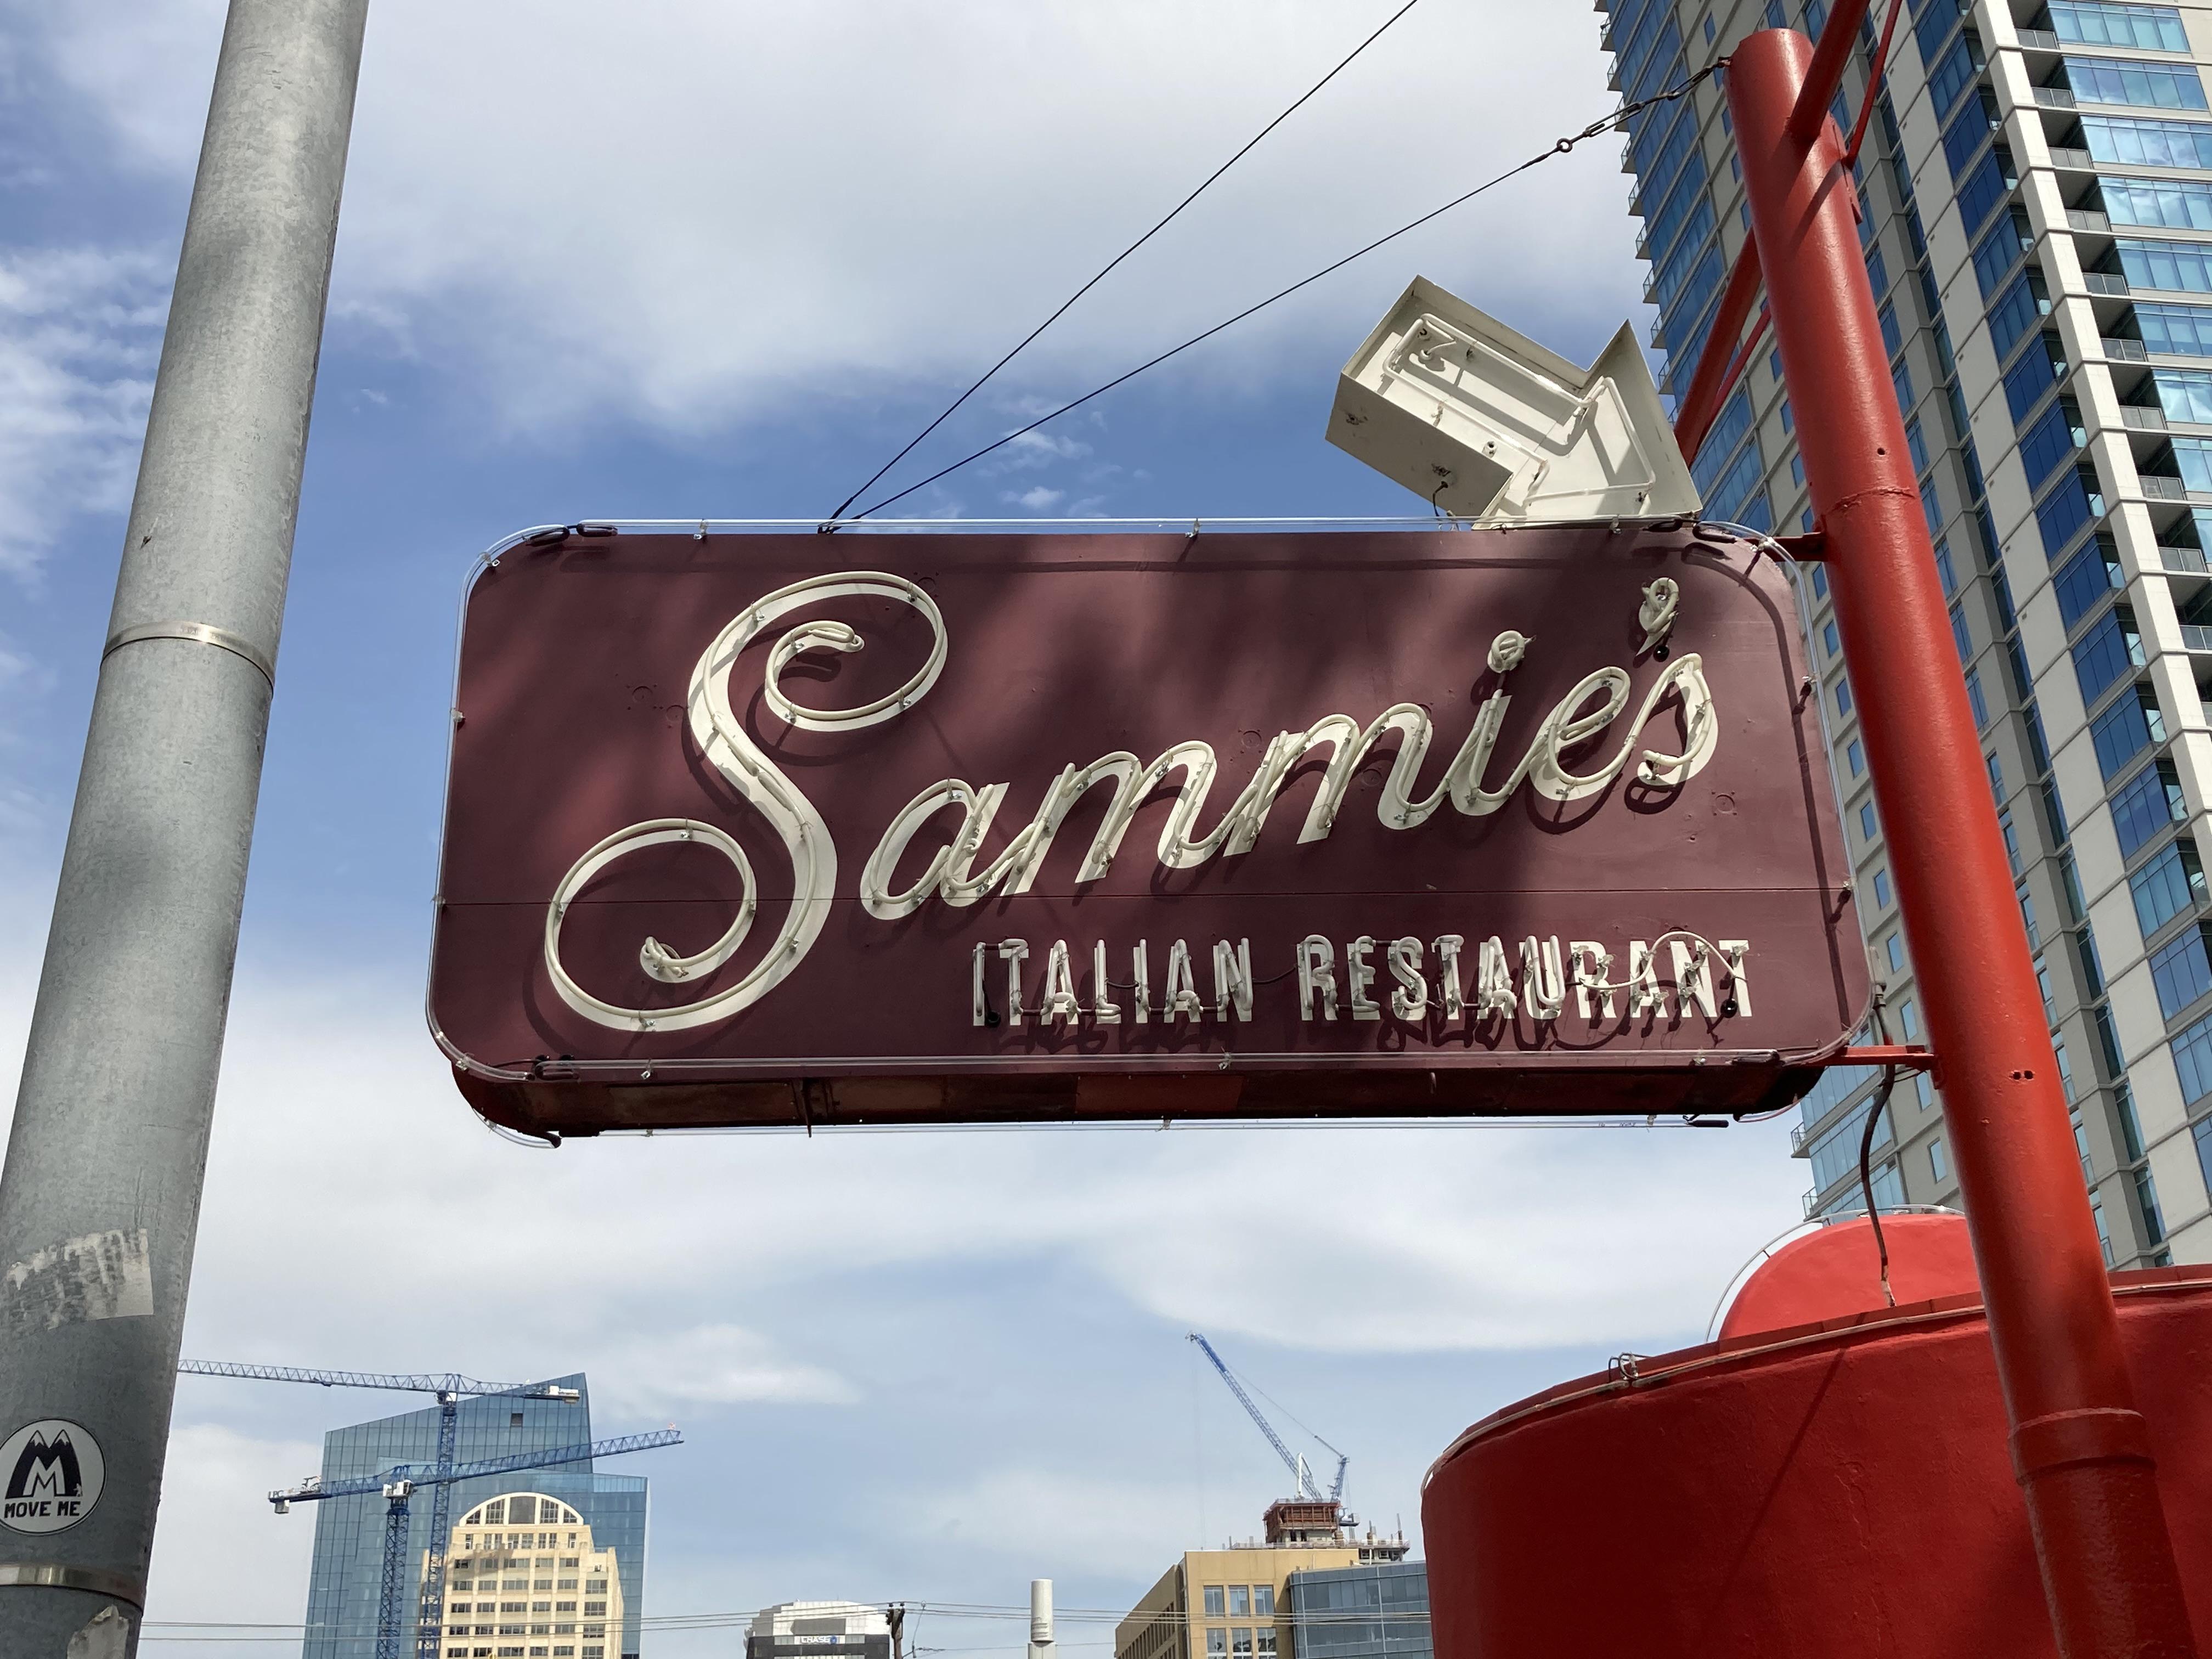 The sign for Sammie's Italian Restaurant